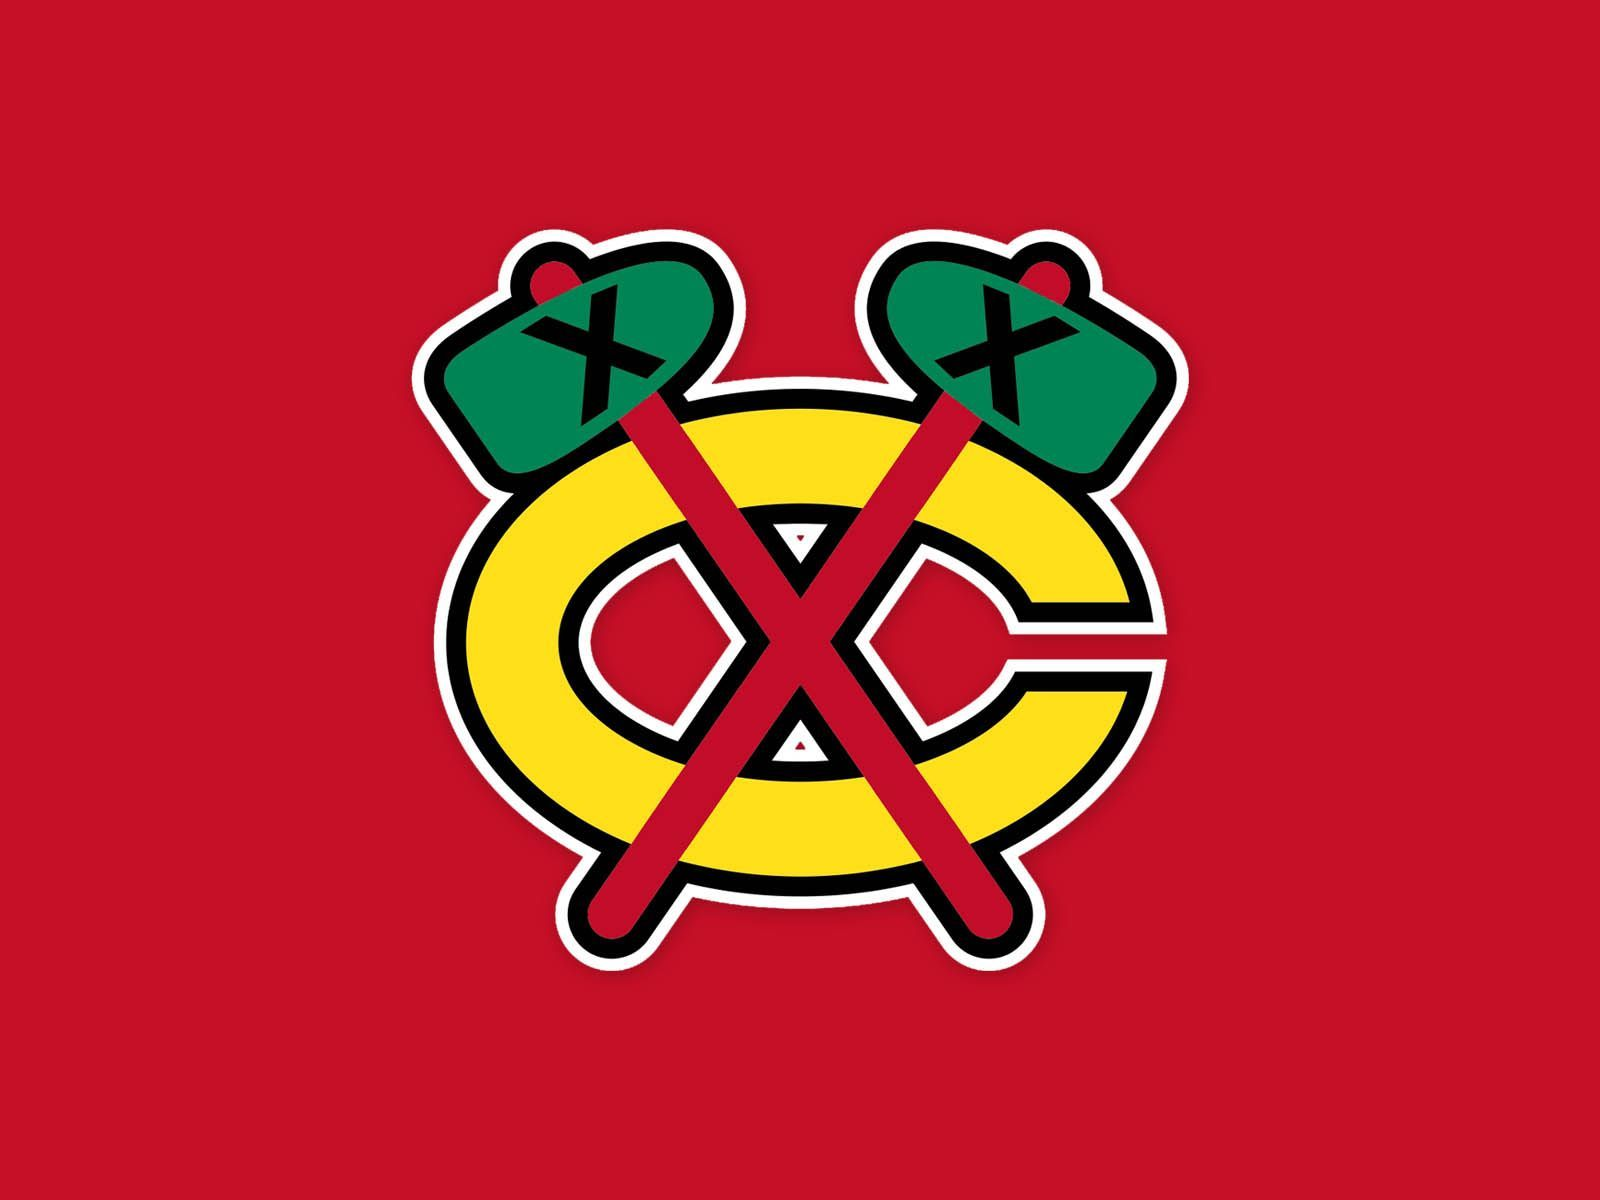 blackhawks logo background 2018 wallpapers hd chicago blackhawks rh pinterest com  chicago blackhawks logo wallpaper